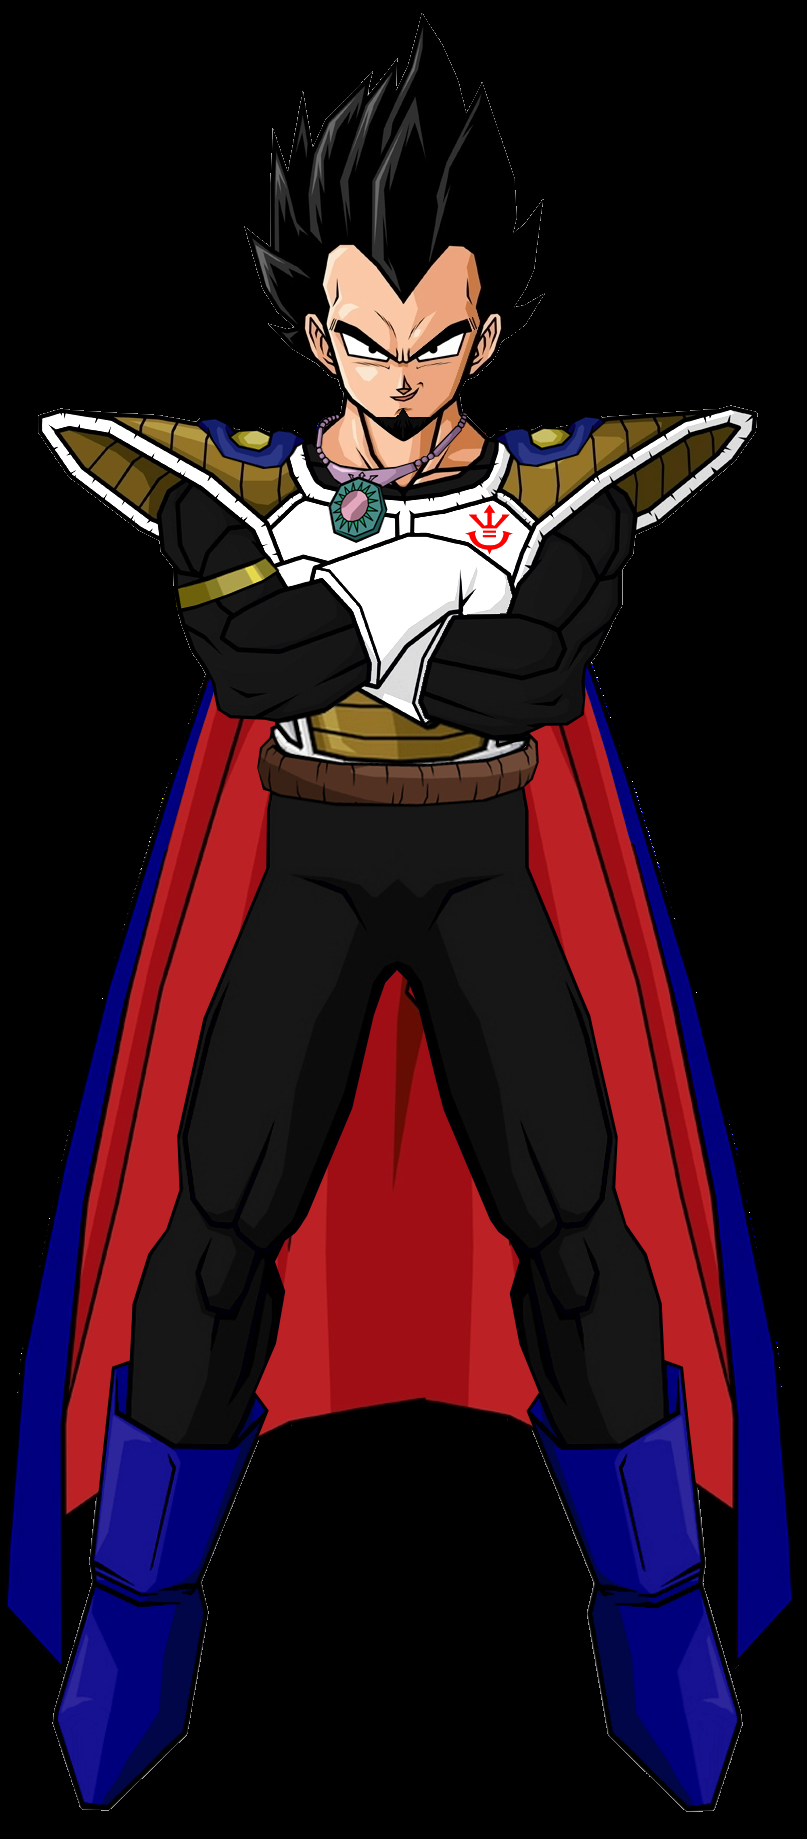 King Satoshi